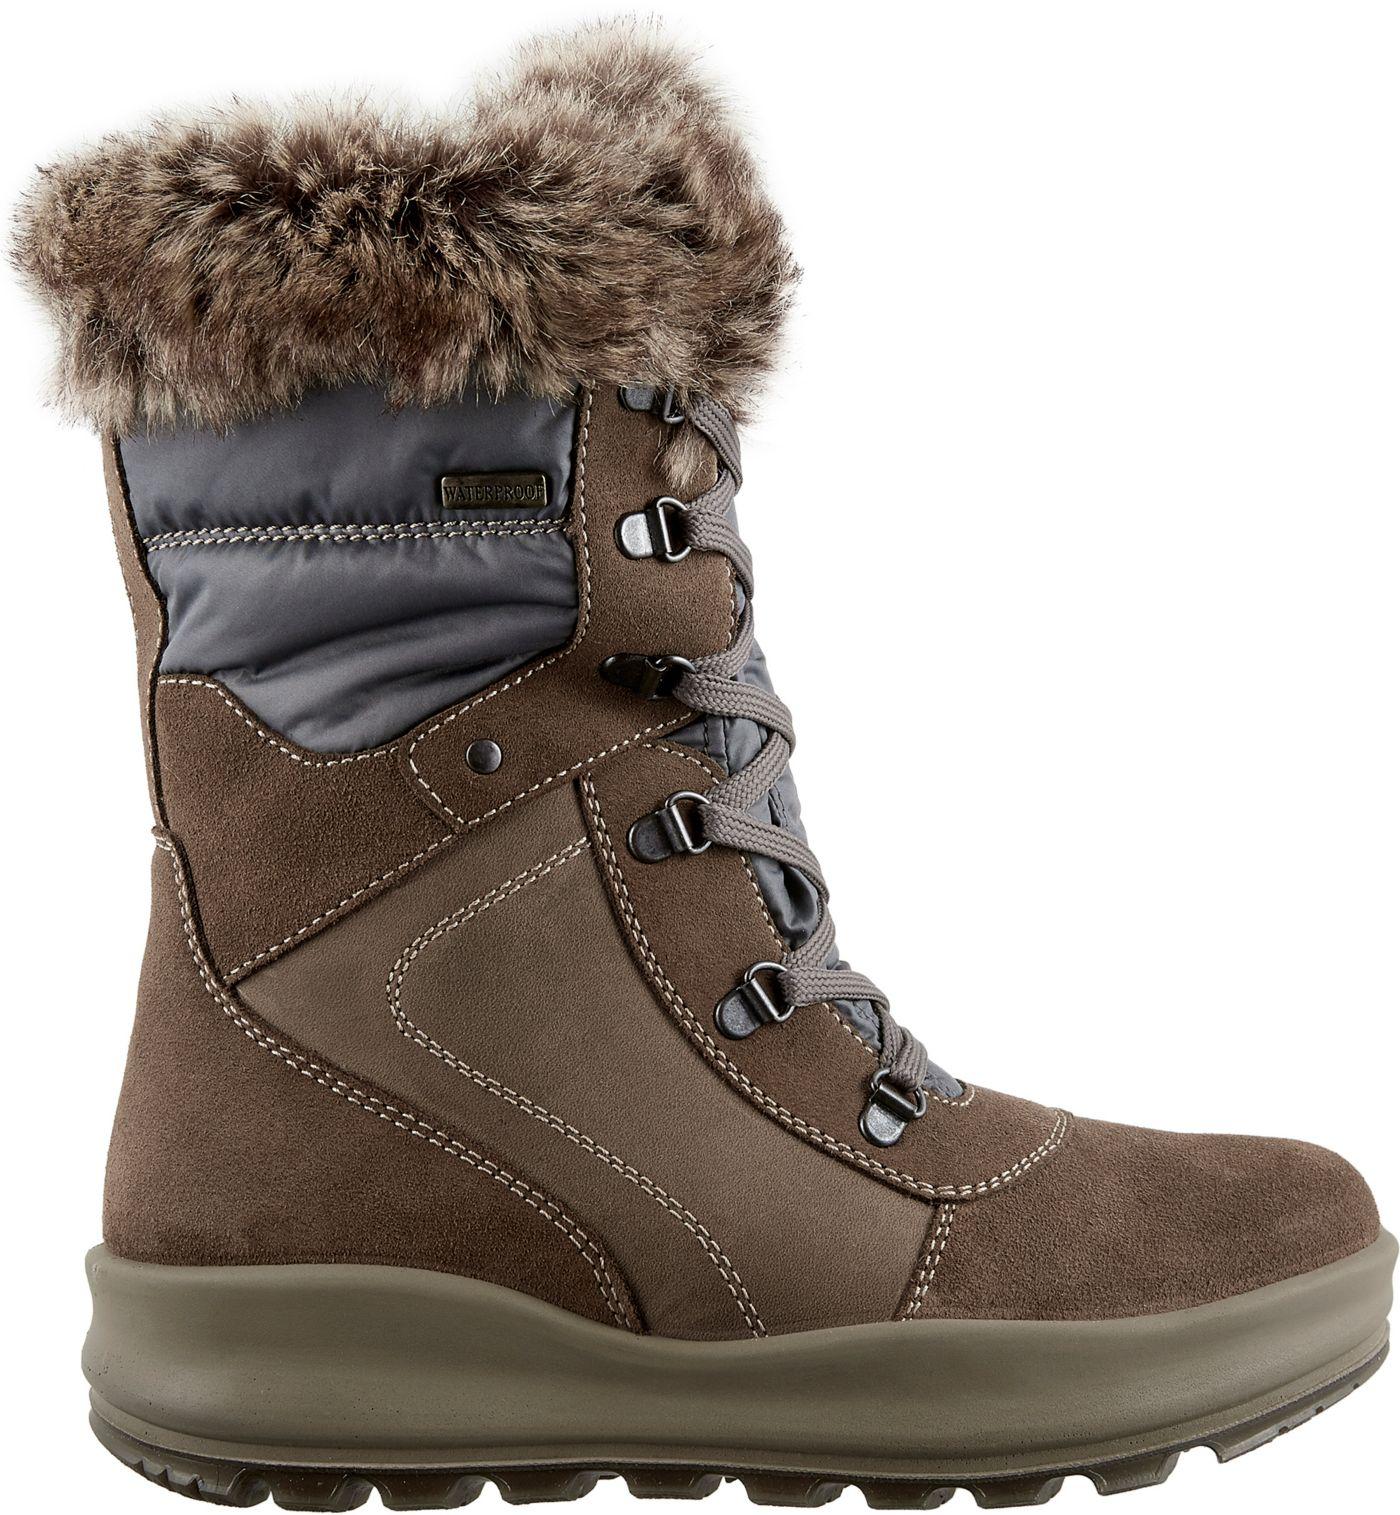 Alpine Design Women's Sofia Waterproof Winter Boots